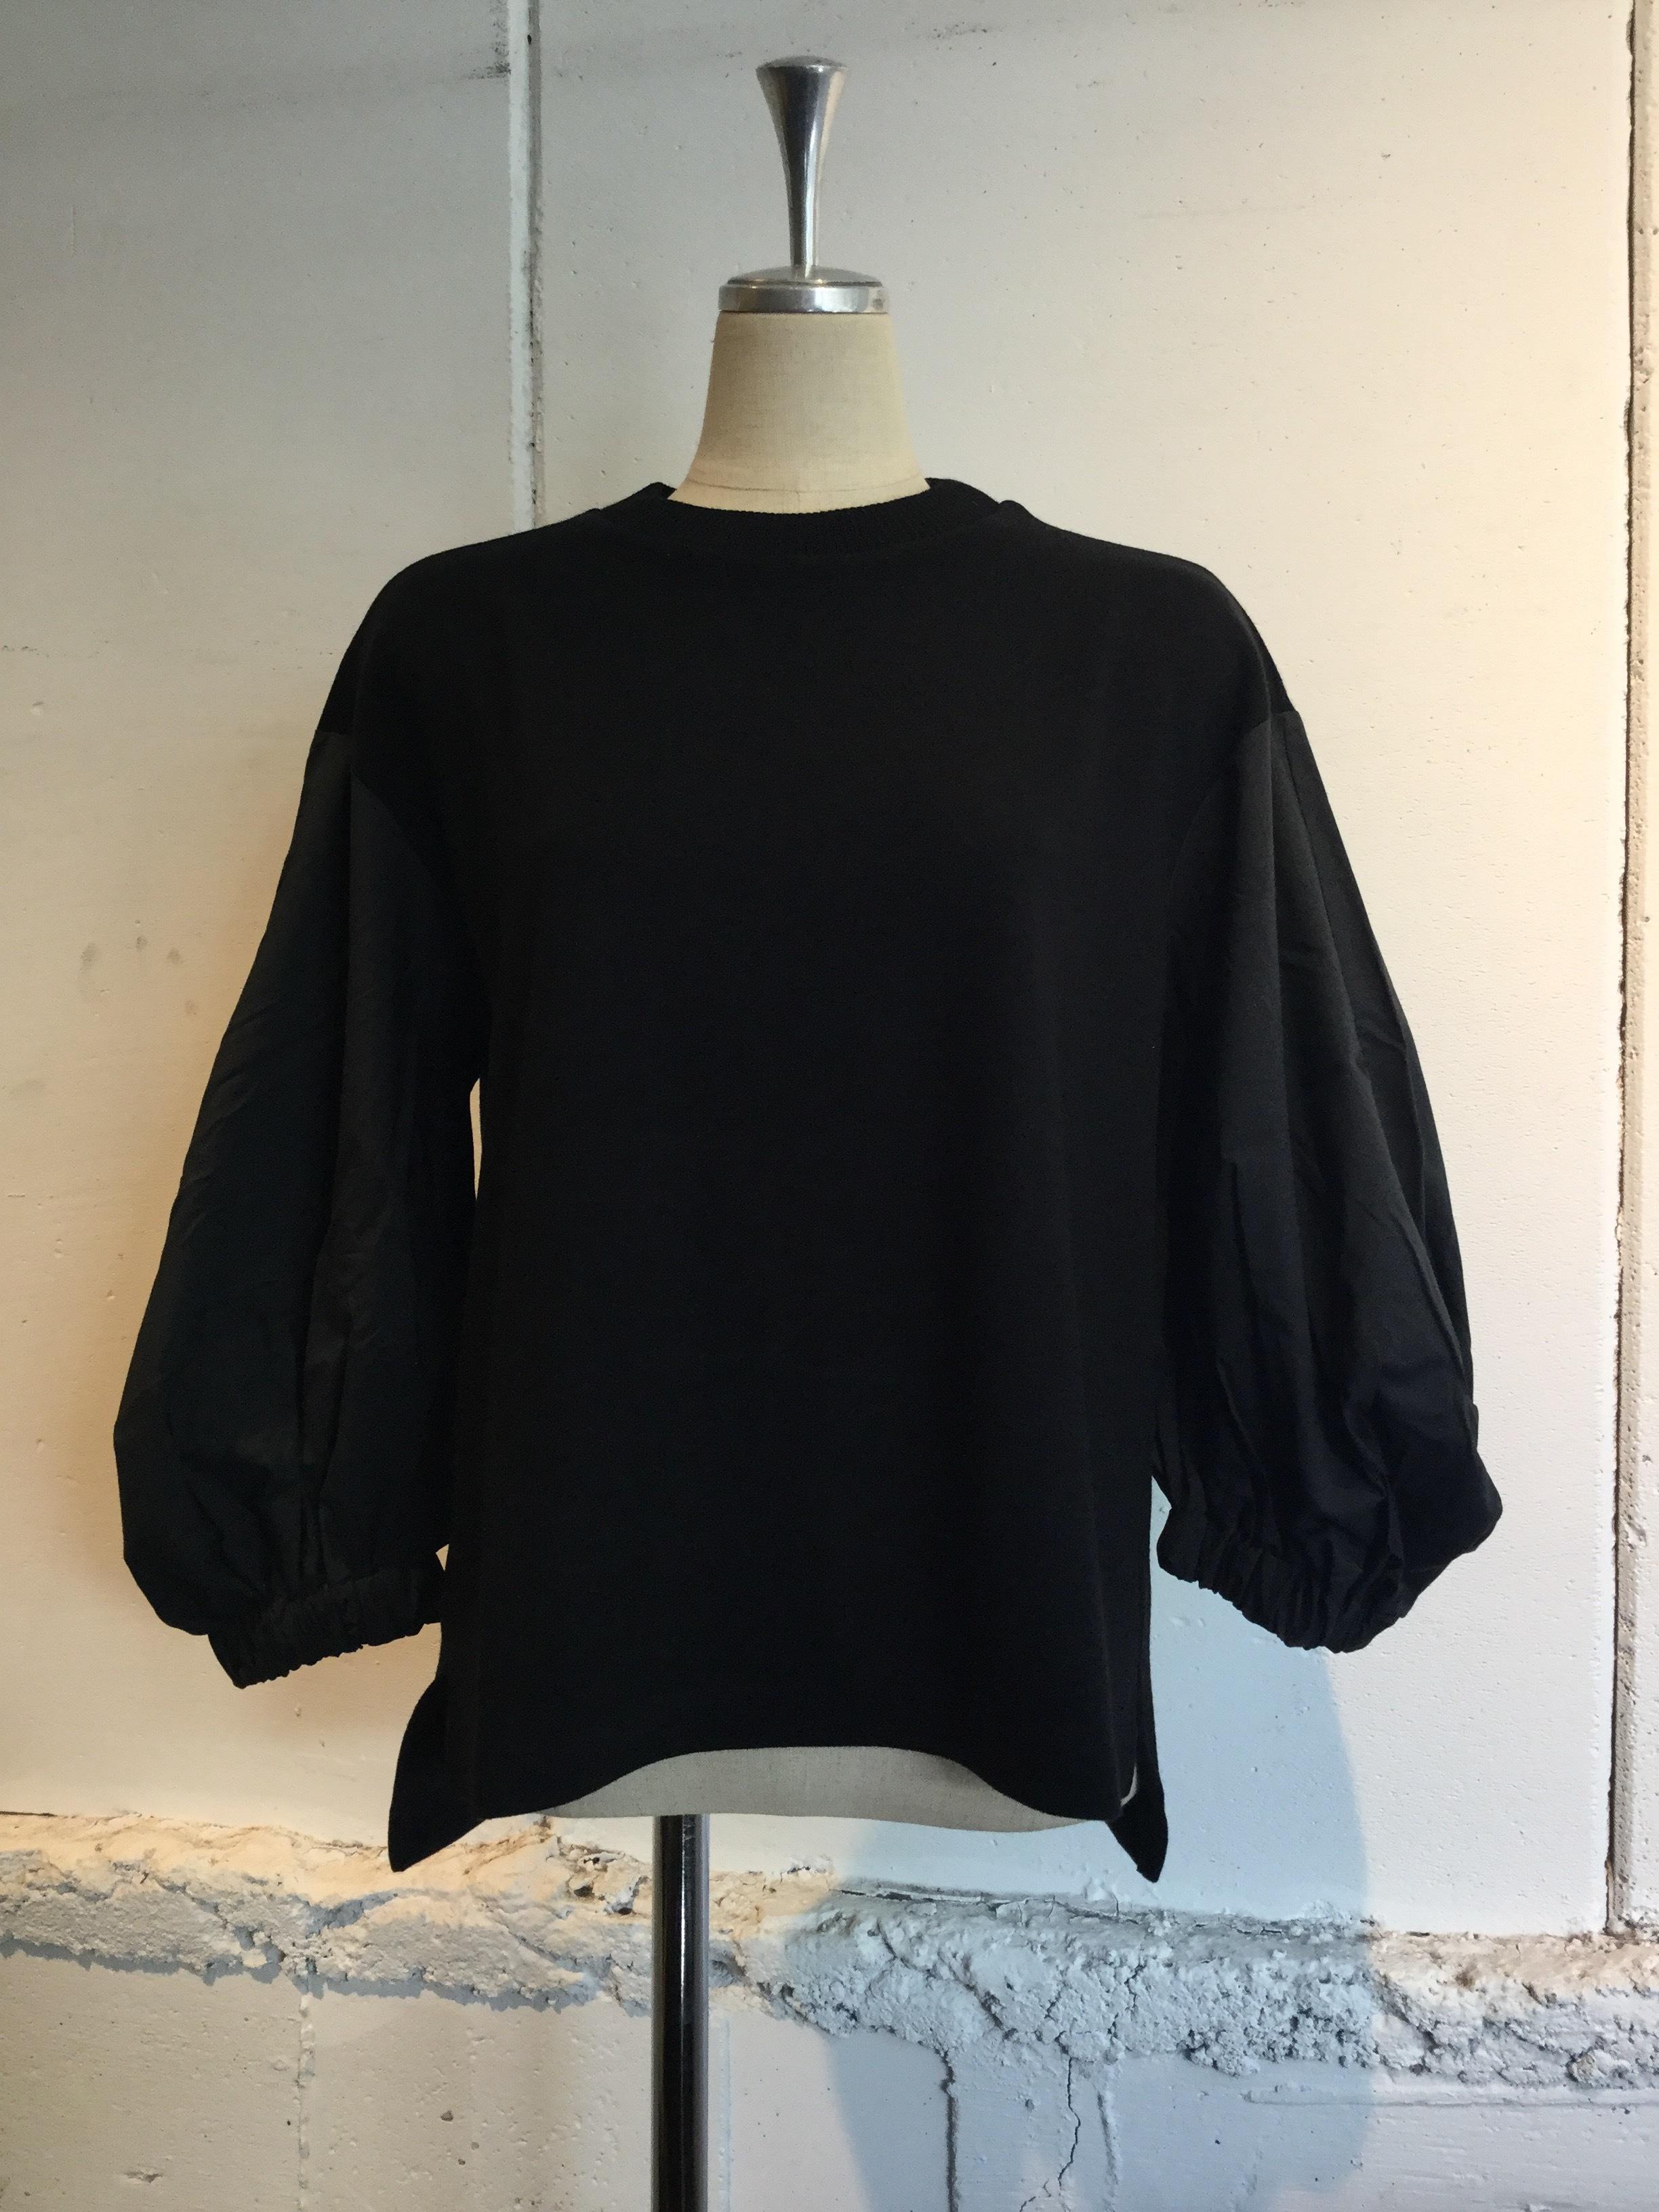 MUVEIL WORK 布帛袖プルオーバー (black)